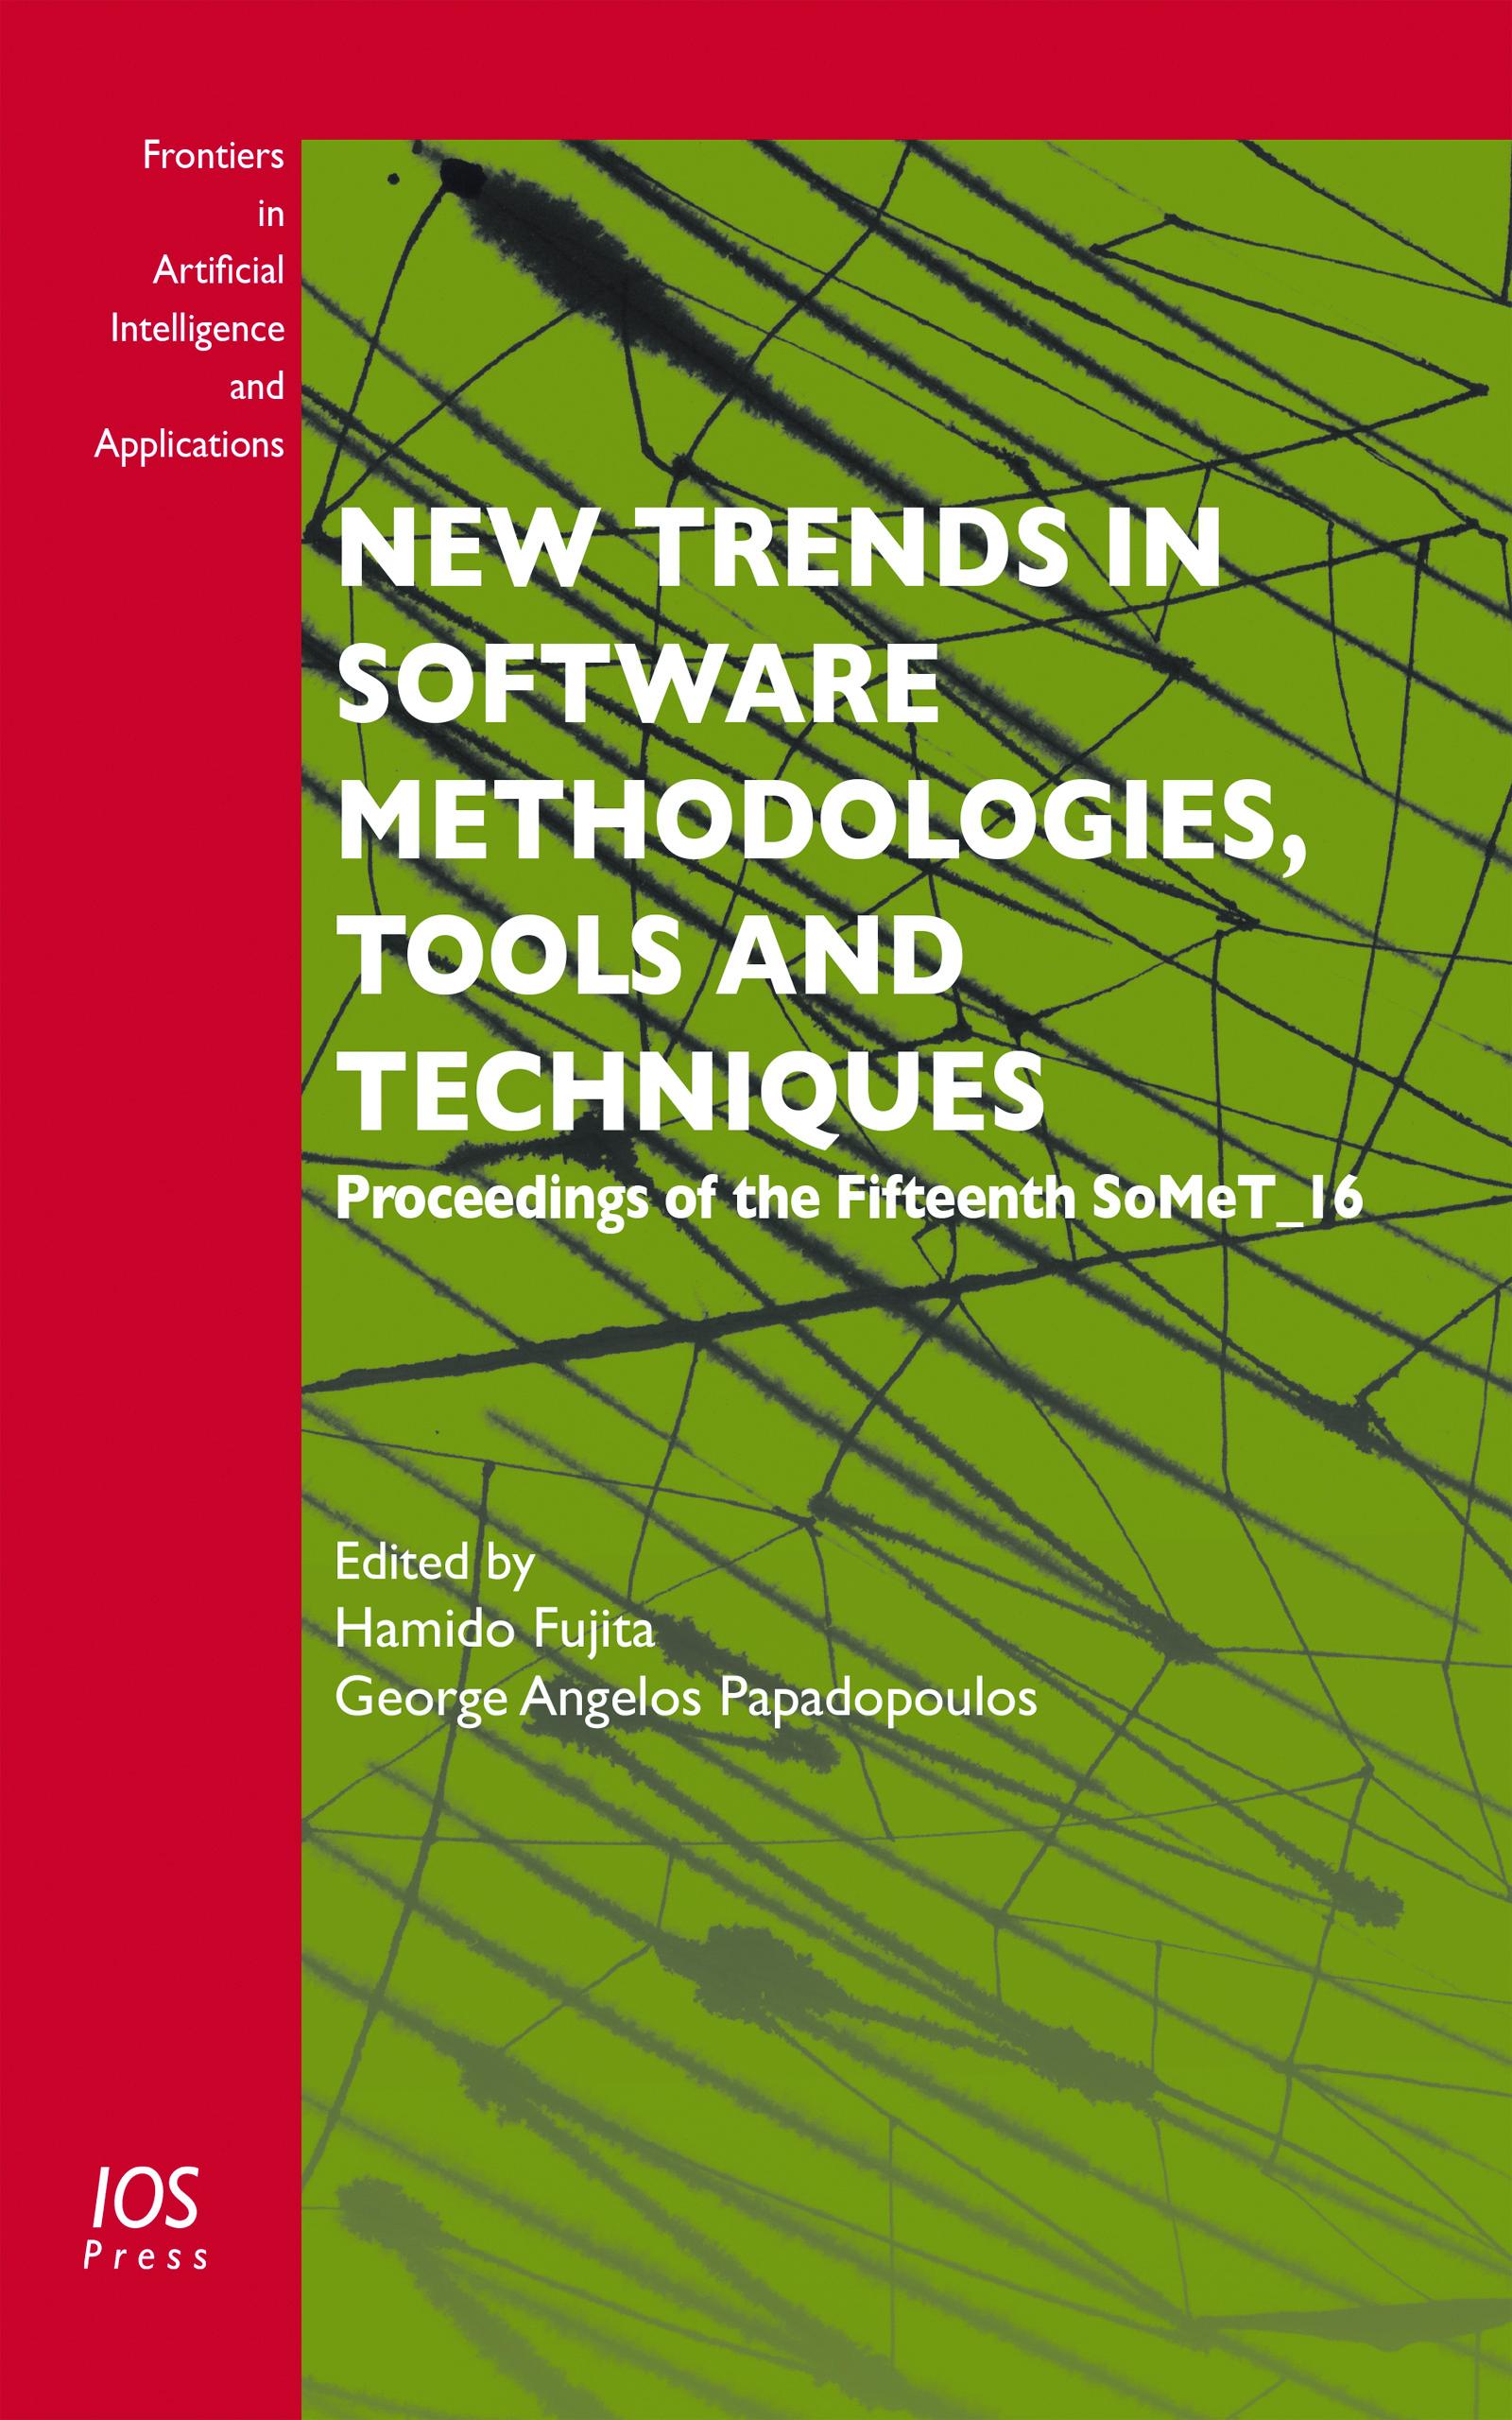 new trends in software methodologies tools and techniques fujita h revetria r